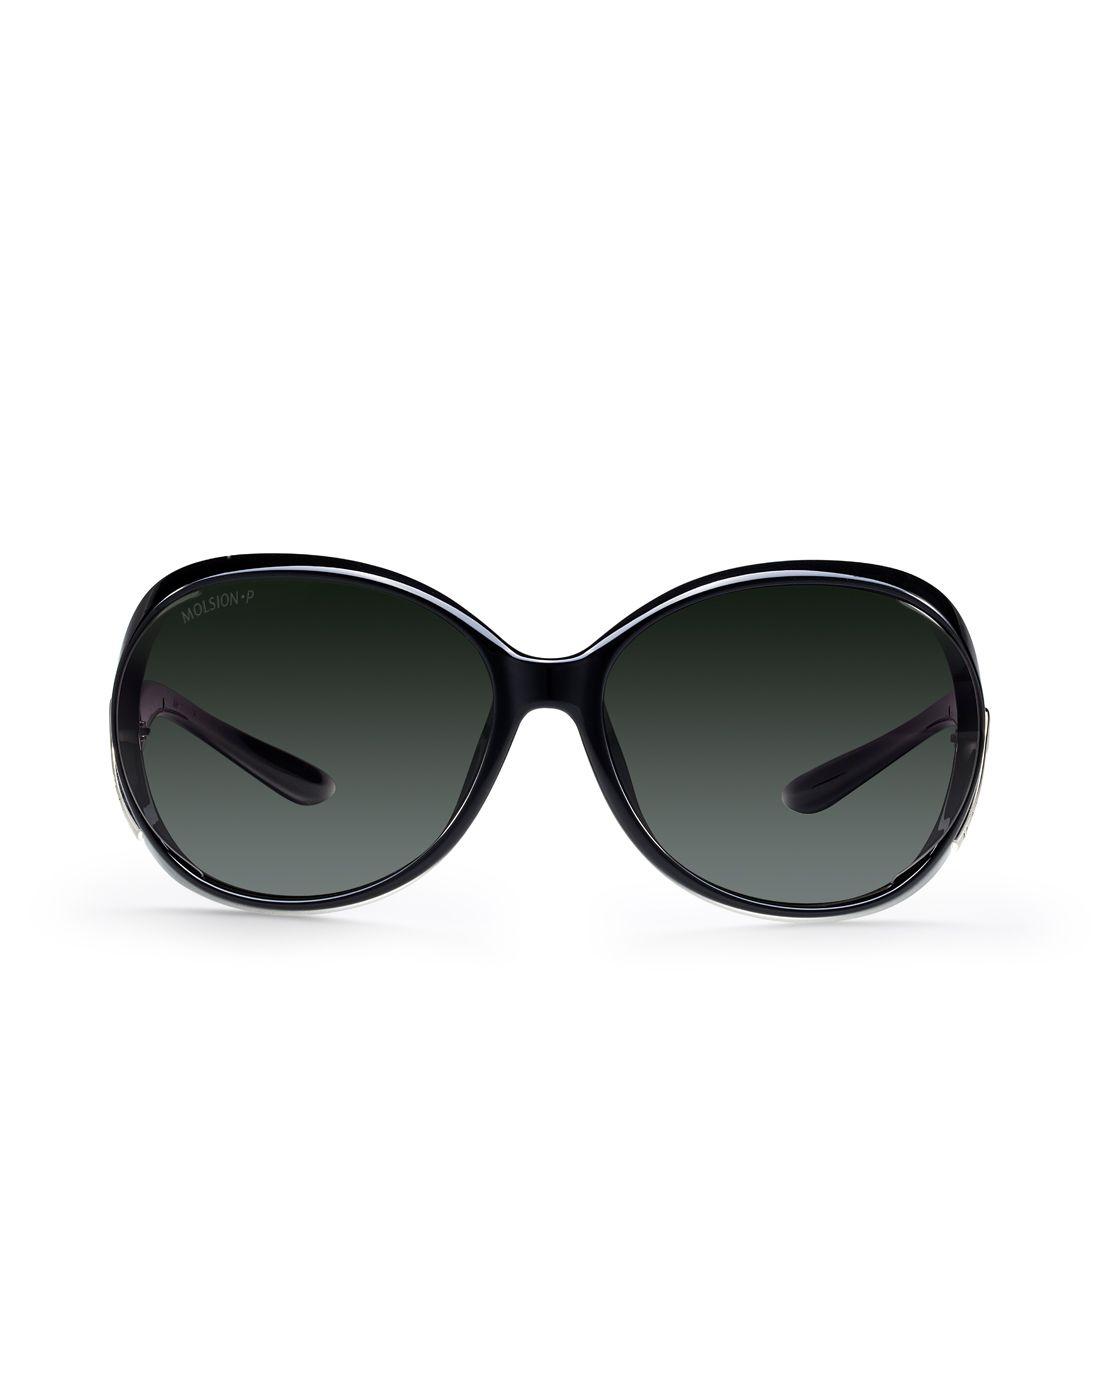 陌森molsion眼镜专场molsion陌森经典大框超轻偏光镜